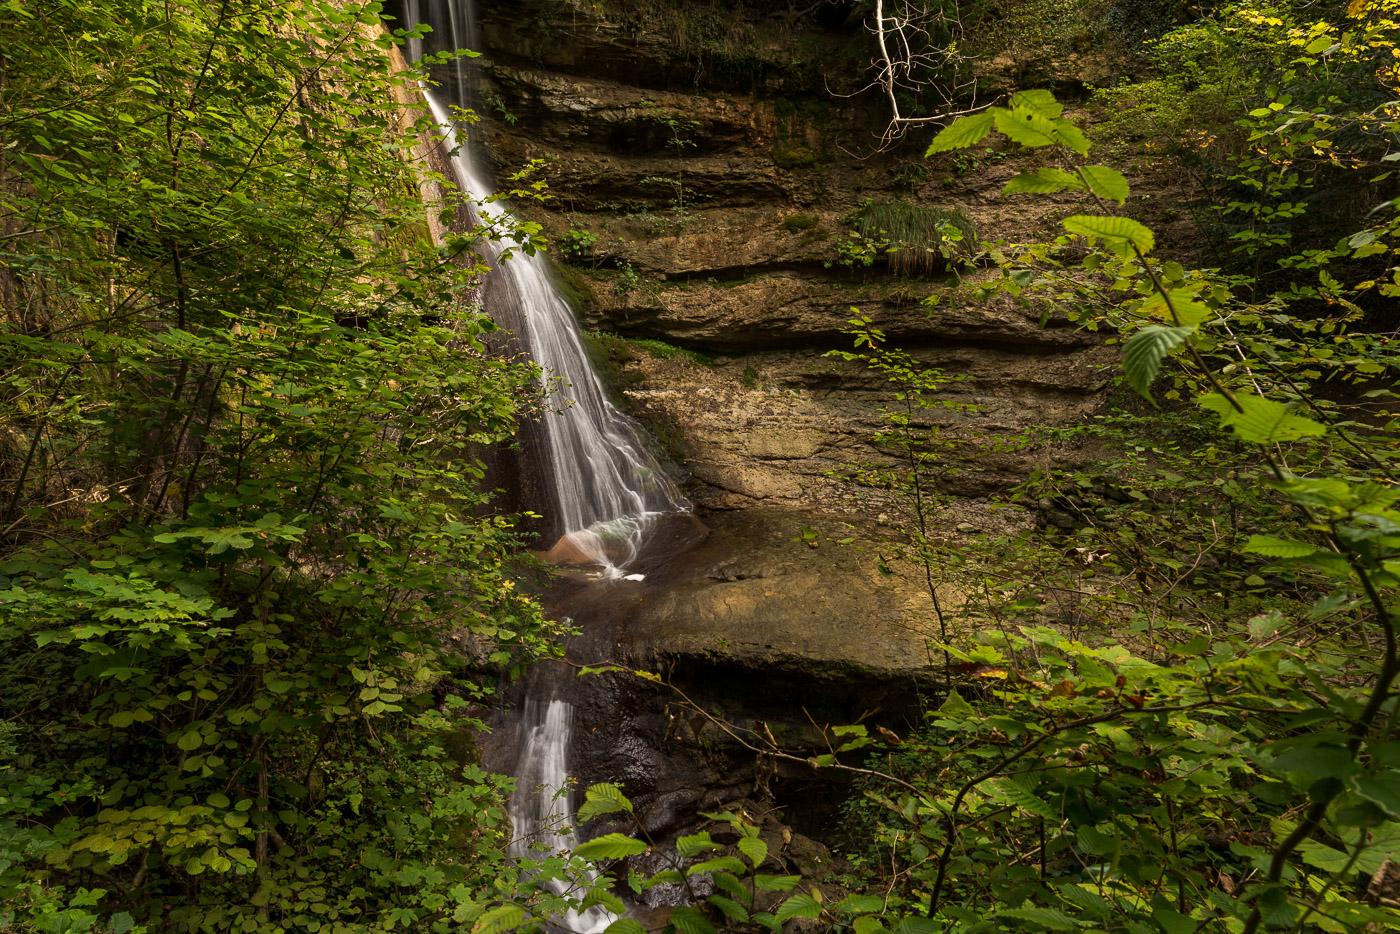 Wasserfall am Dorfbach in Erlenbach